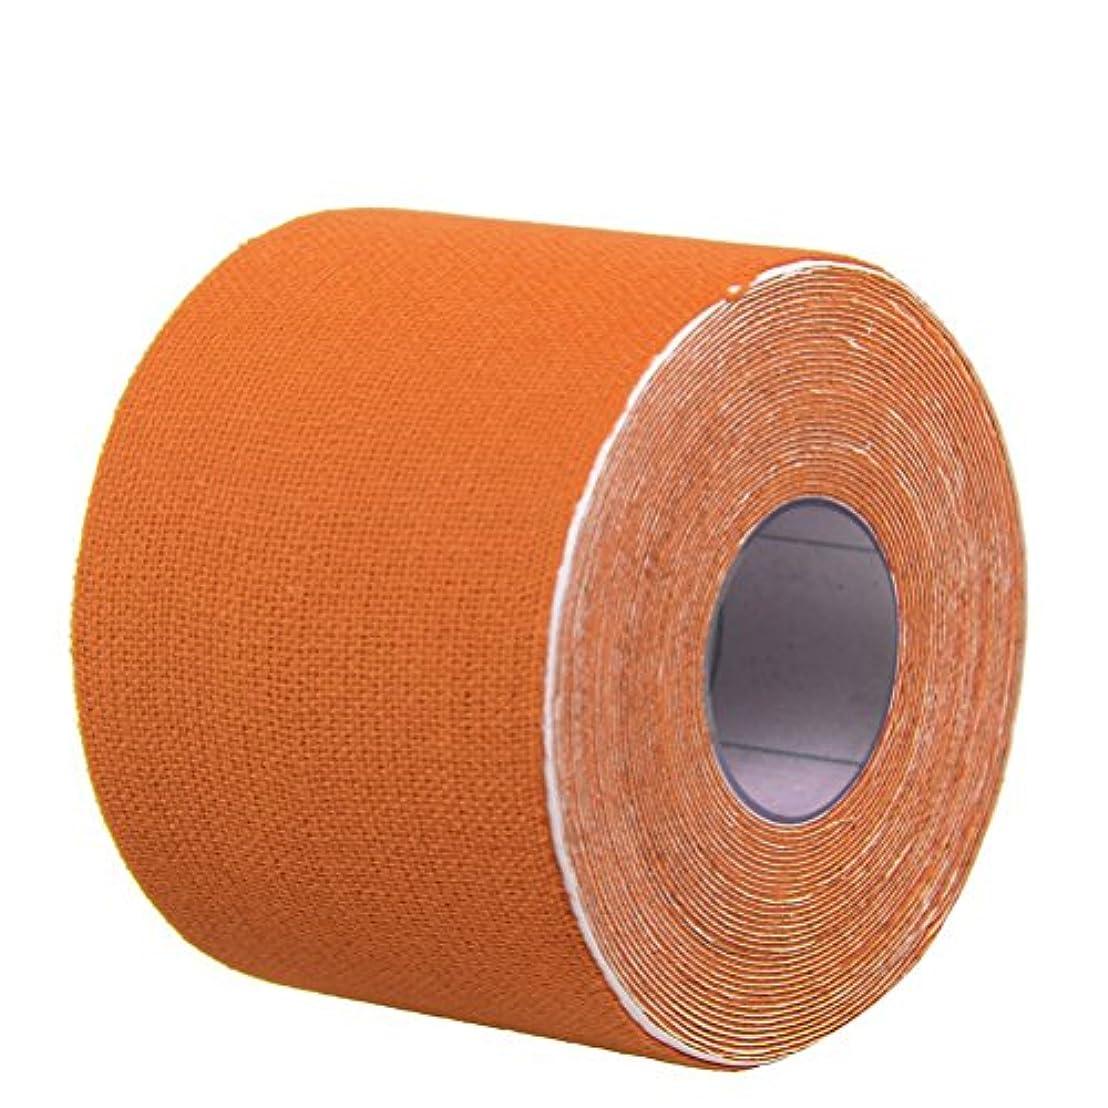 ROSENICE キネシオロジーテープセットセラピースポーツフィジオセラピー500x2.5cm(オレンジ)